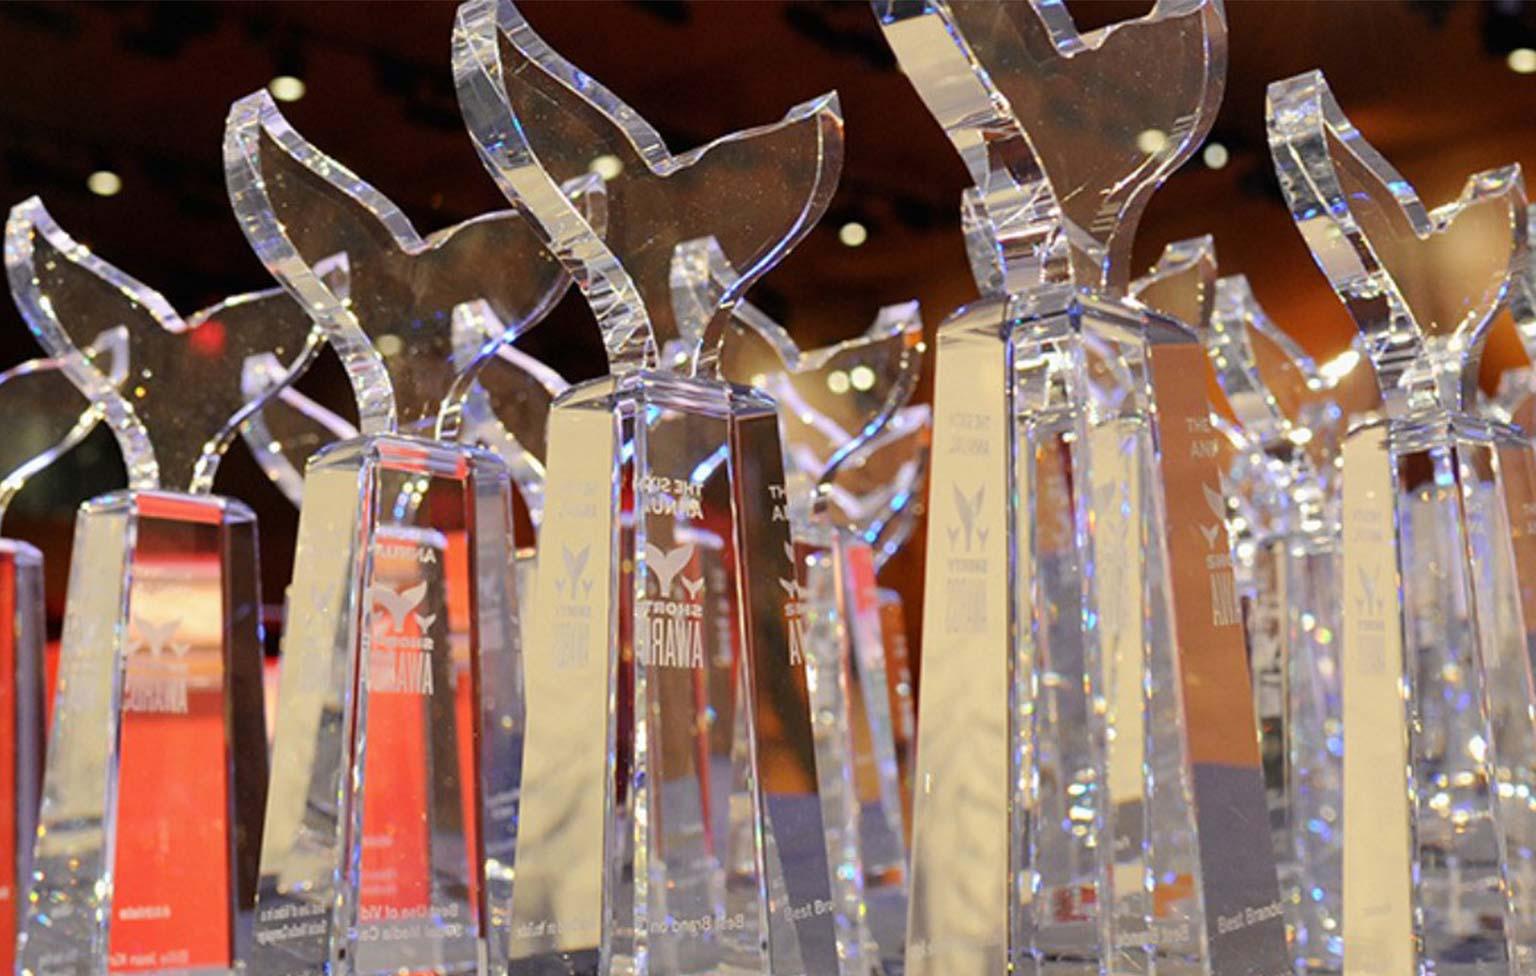 Bottle Rocket Nominated for Two 2017 Shorty Awards